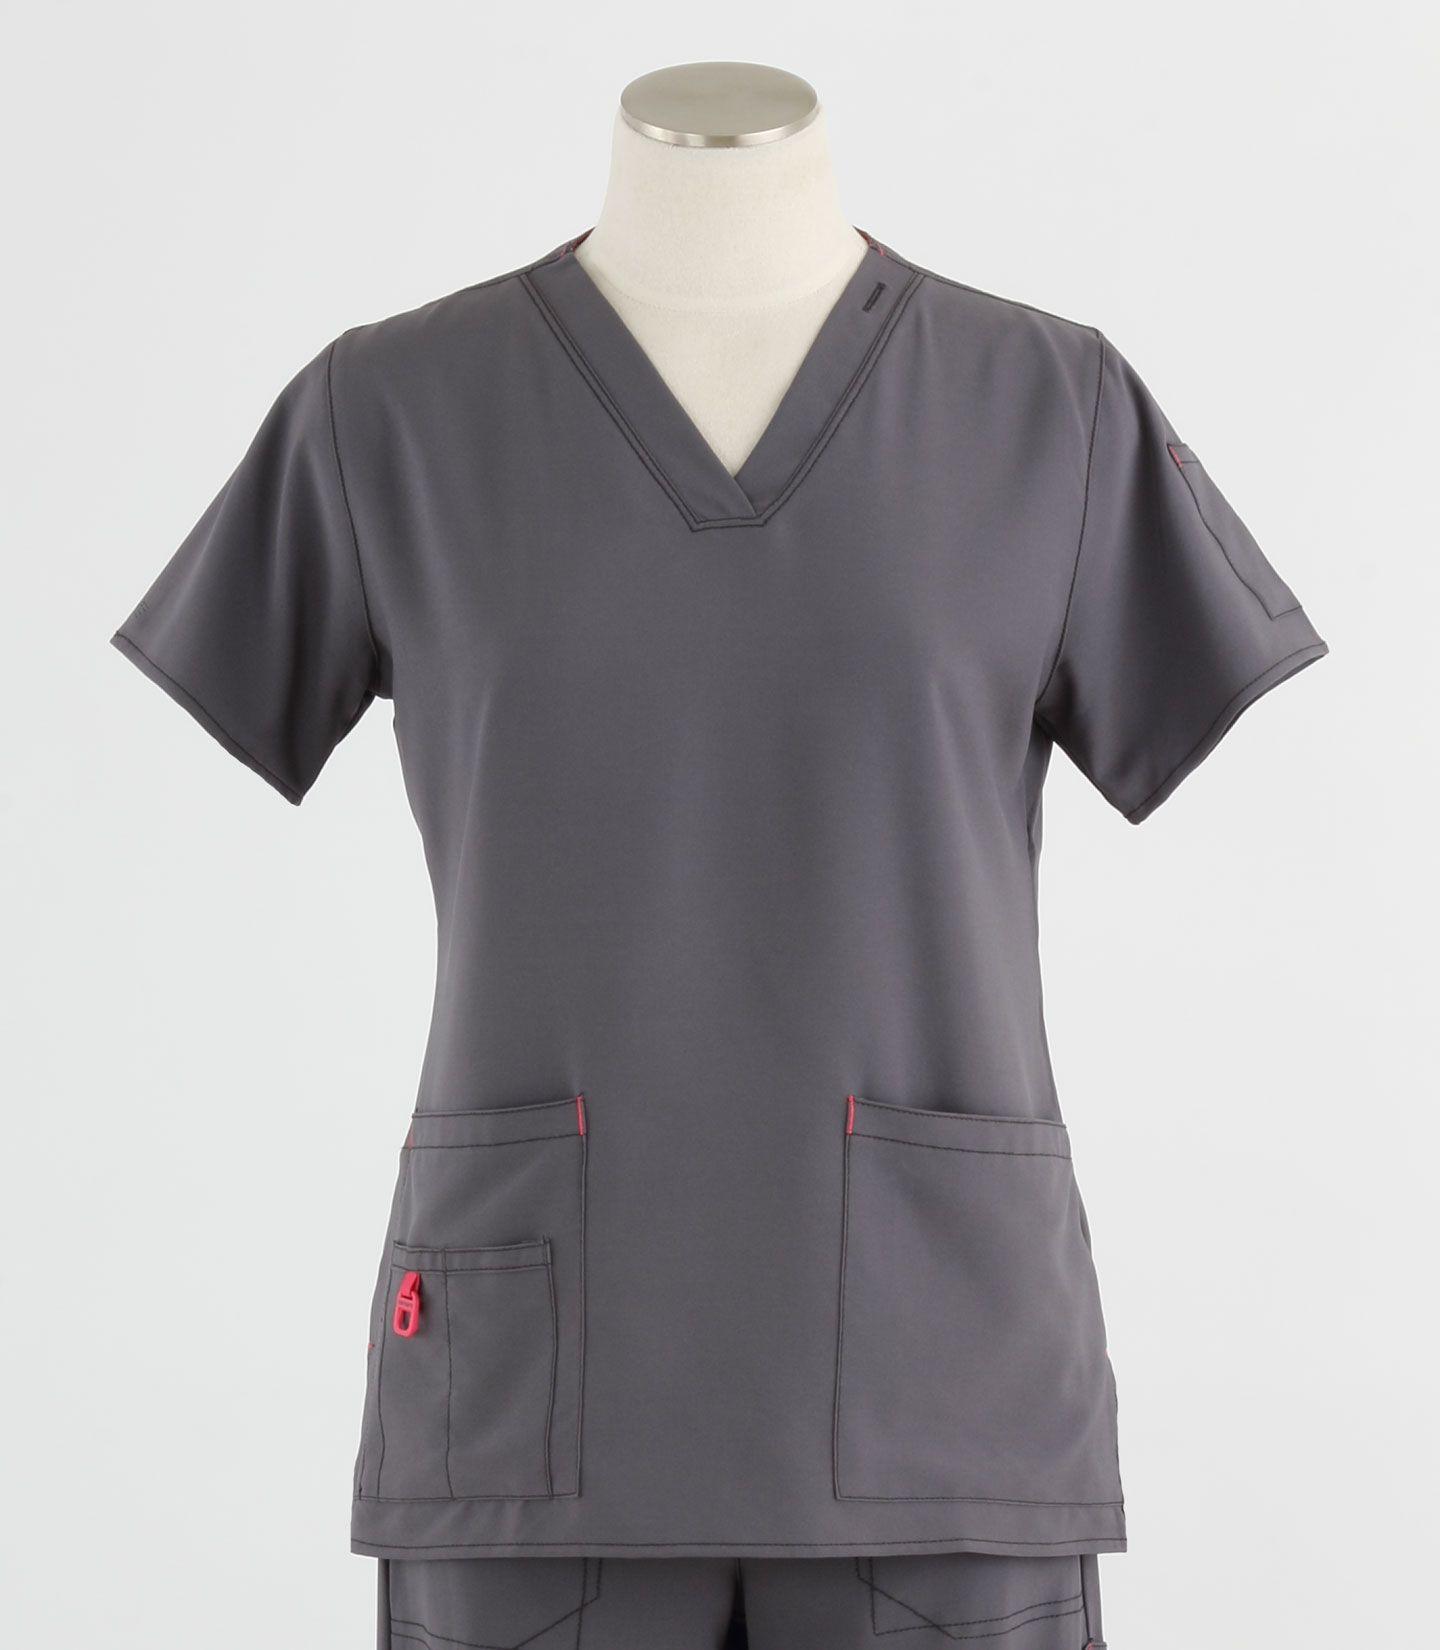 New Black Cherokee 4727 Mock V Neck Scrub Top Size Large Nurse Medical Dental